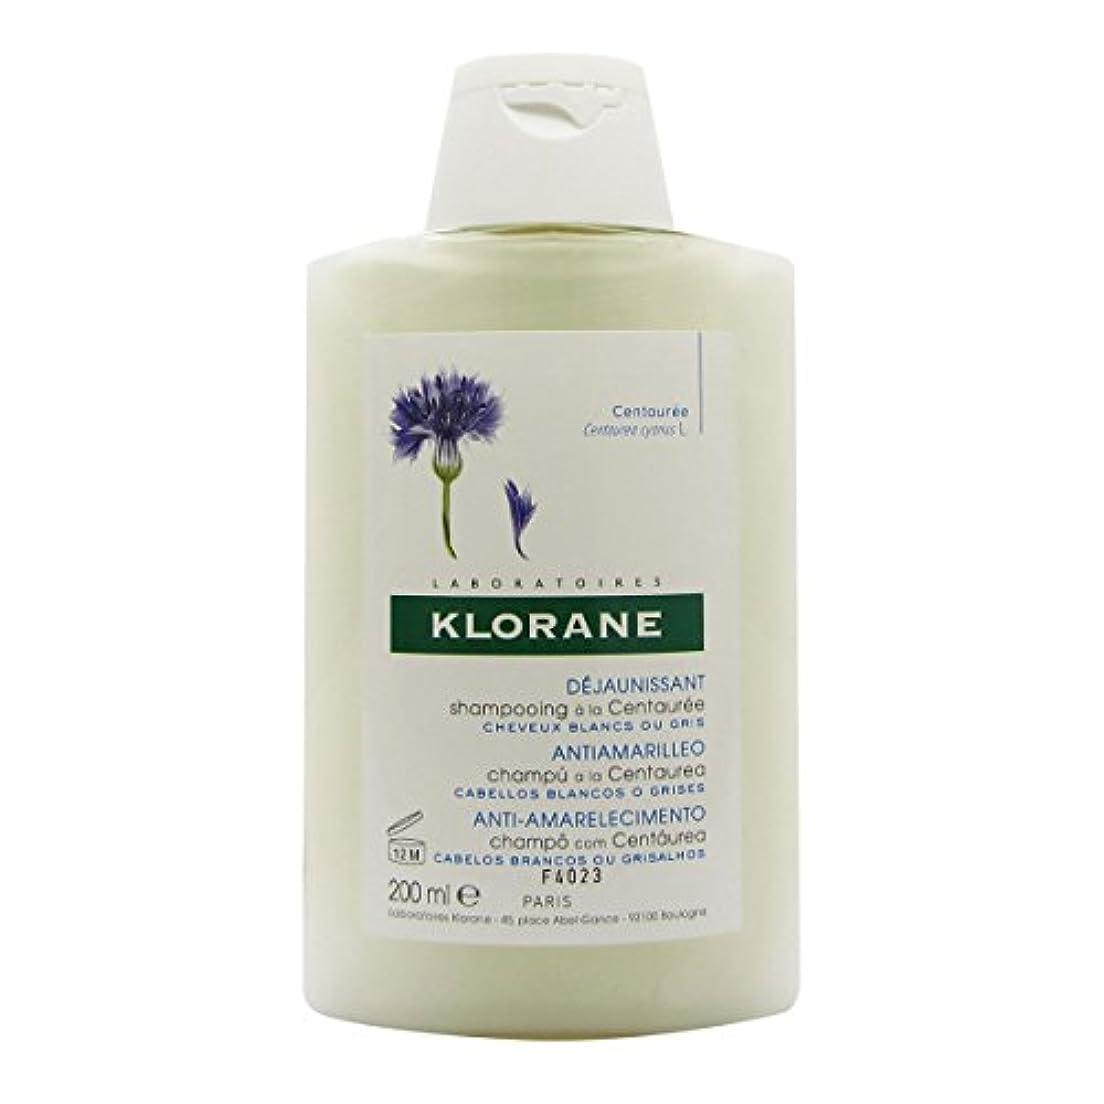 敬礼余剰付録Klorane Shampoo With Centaury 200ml [並行輸入品]